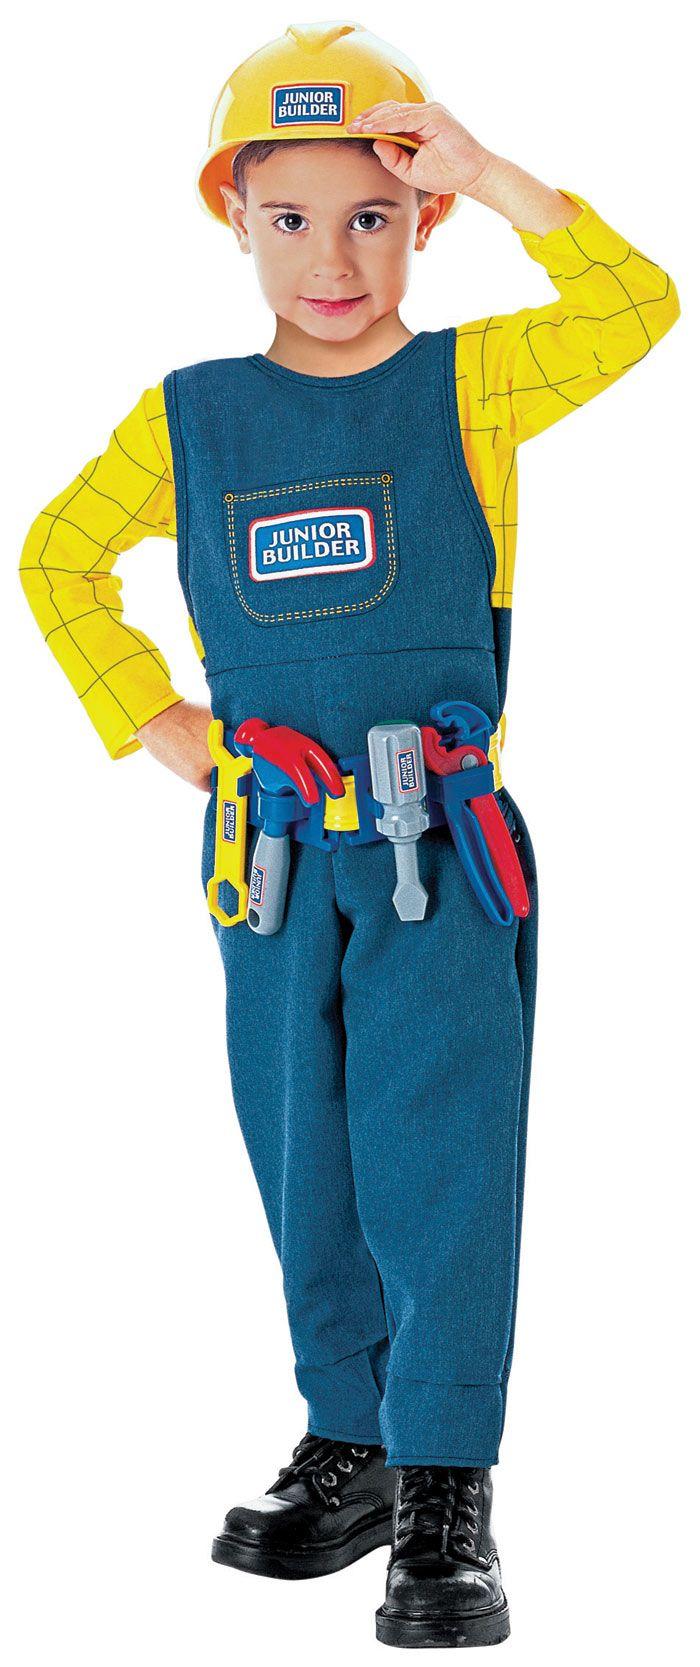 Junior Builder Everyday-Play Career Costume #Construction